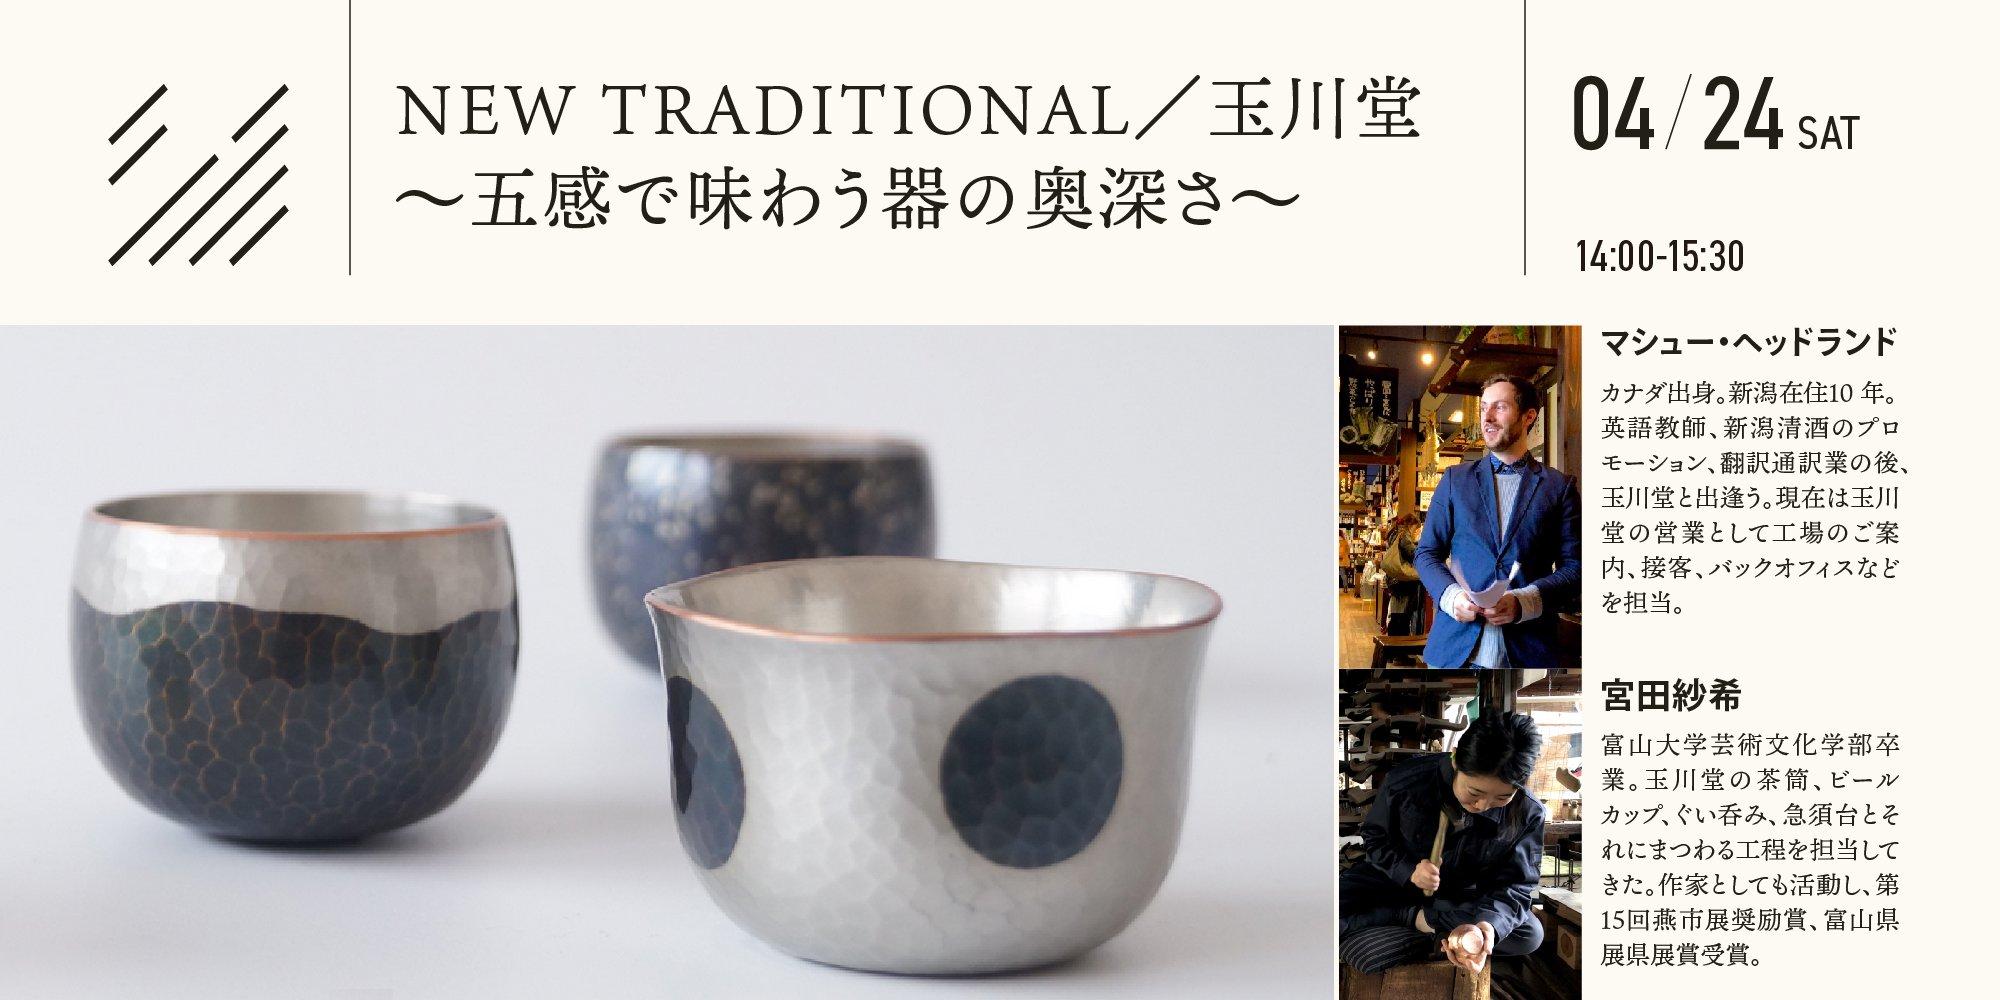 NEW TRADITIONAL/玉川堂~五感で味わう器の奥深さ~